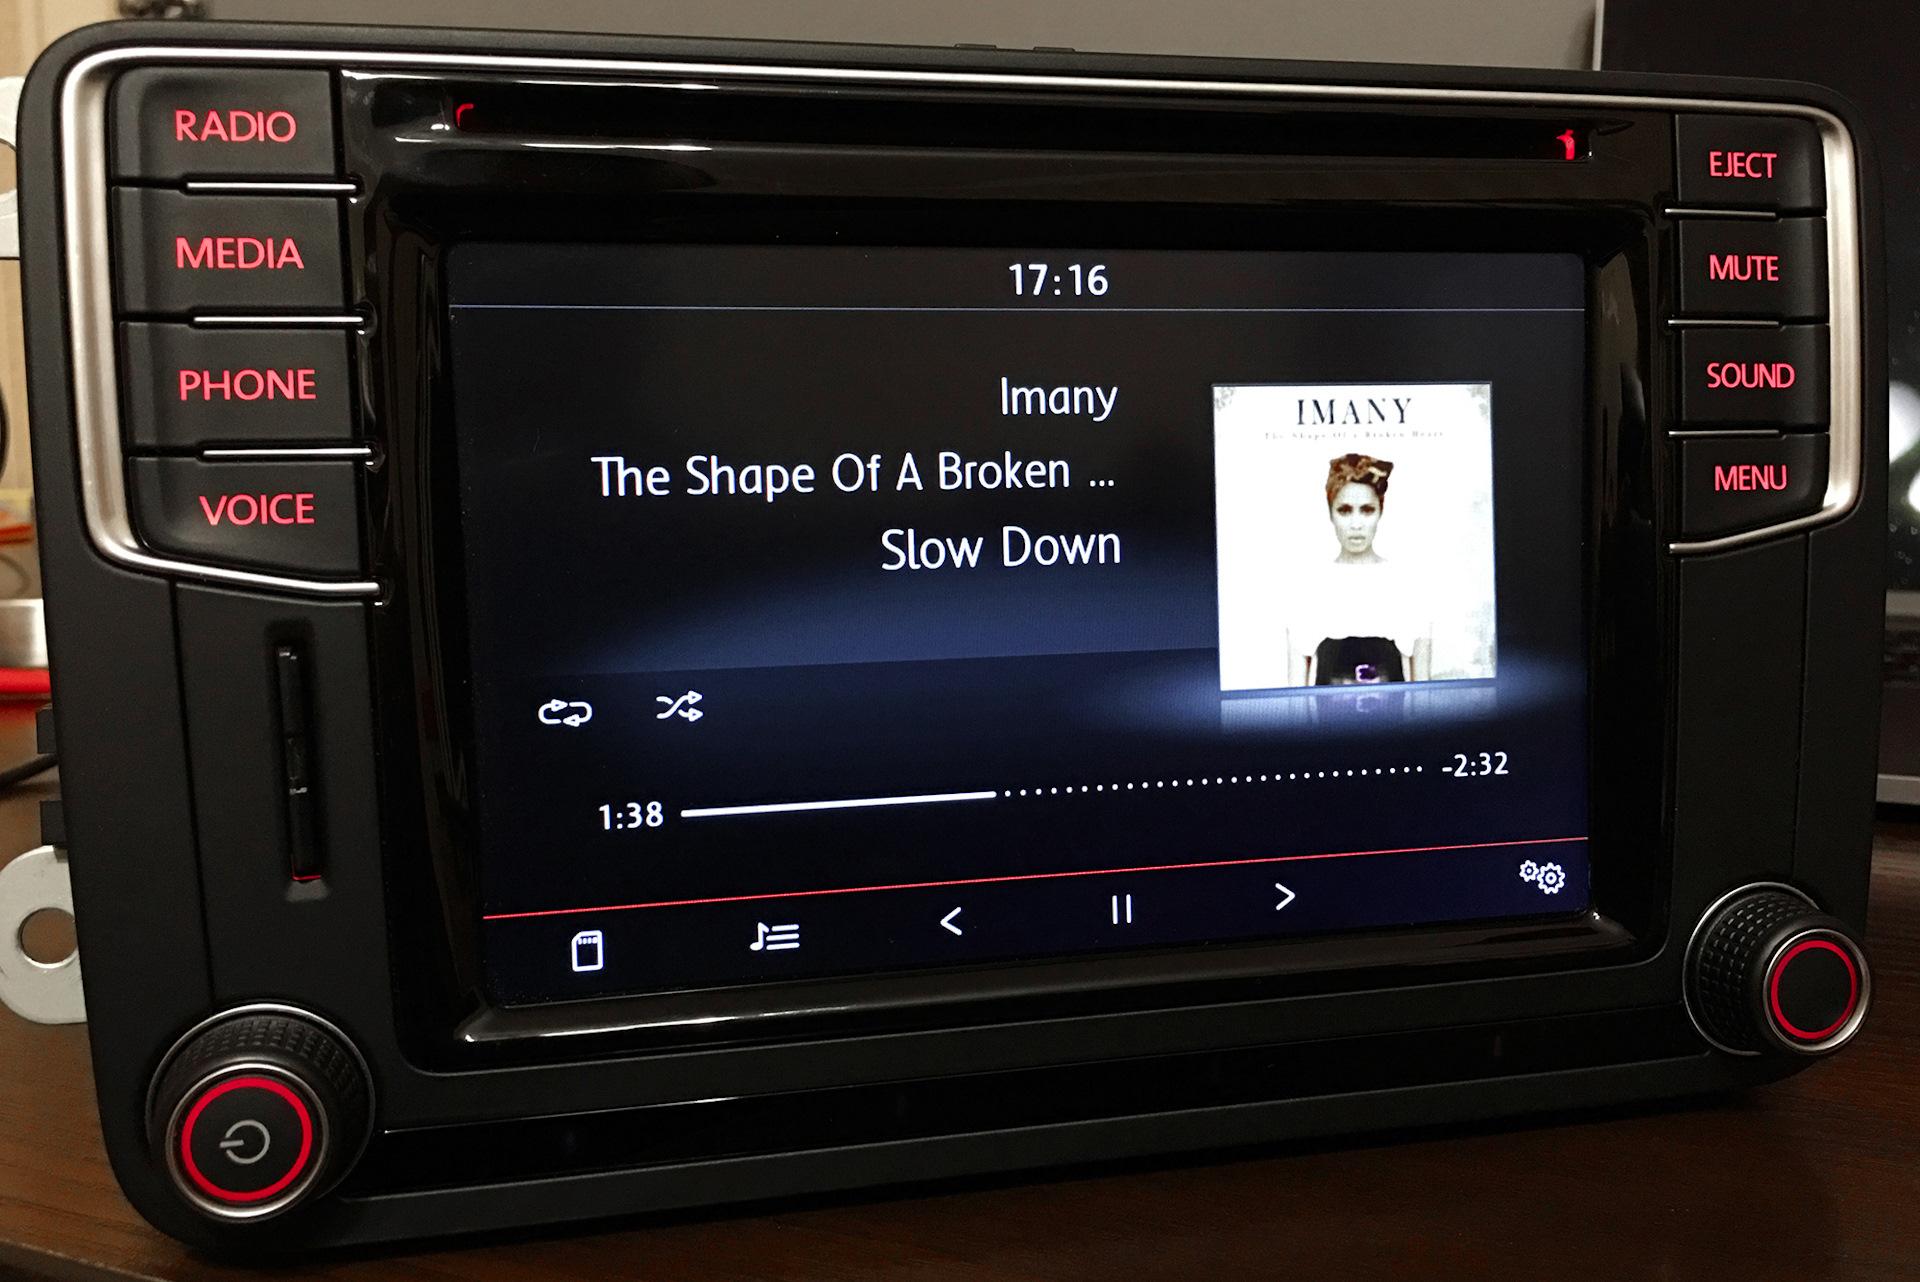 vendo radio composition media original vw app connect t ctil control gestual forocoches. Black Bedroom Furniture Sets. Home Design Ideas